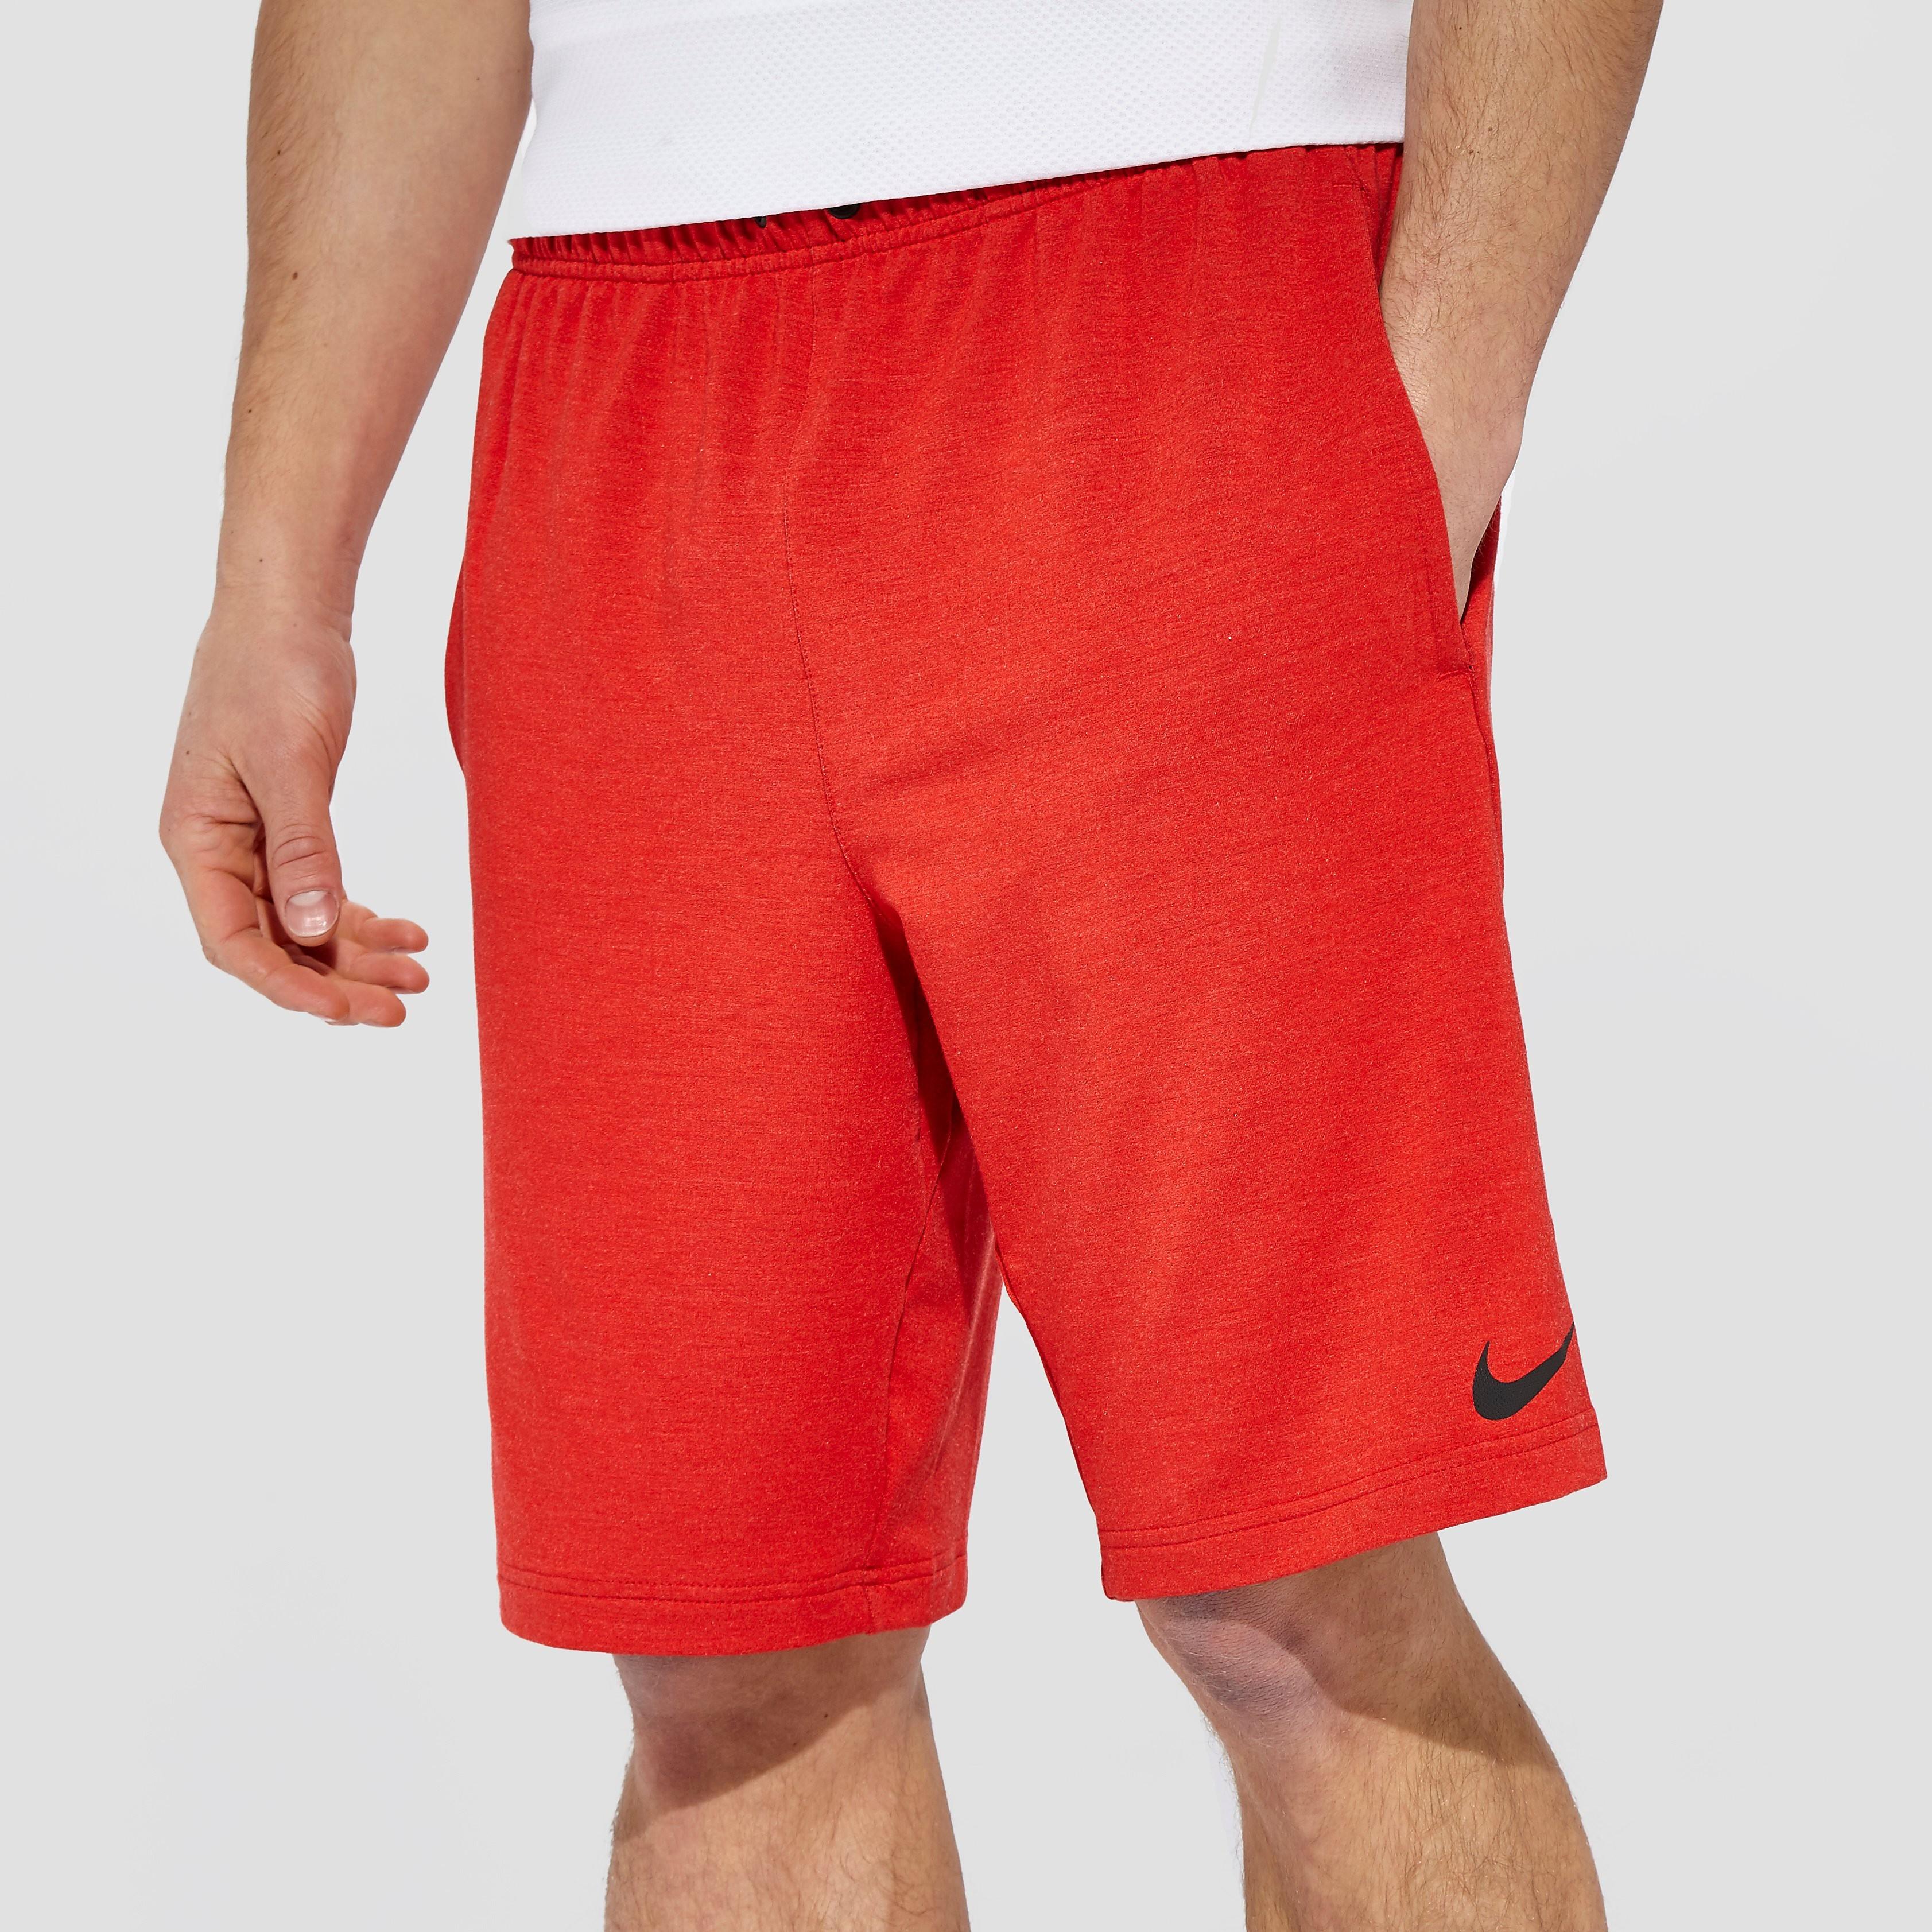 "Nike Dry 8"" Men's Fleece Training Shorts"